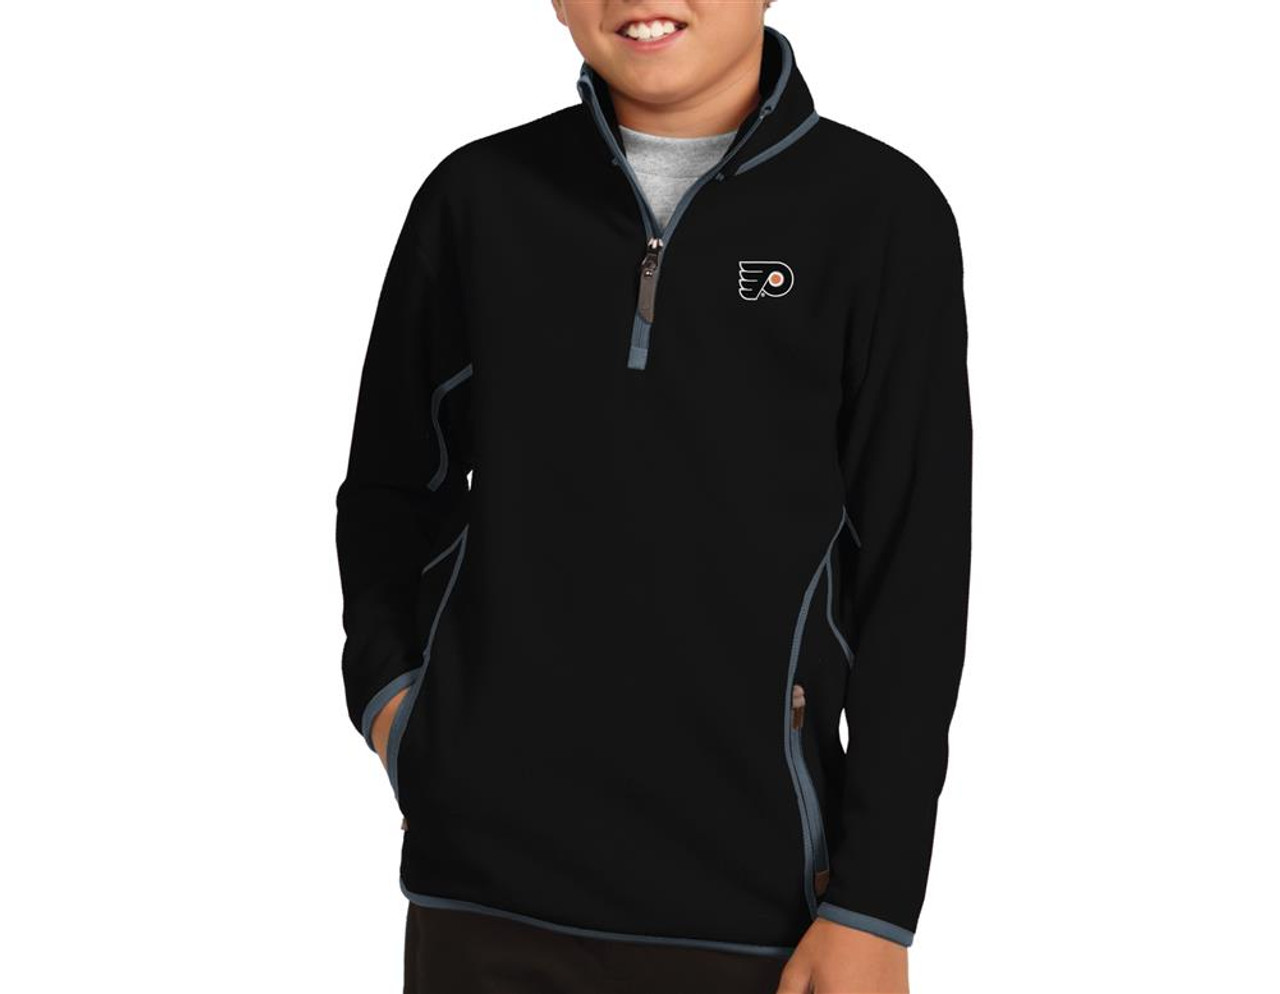 Nashville Predators Youth Pullover Jacket